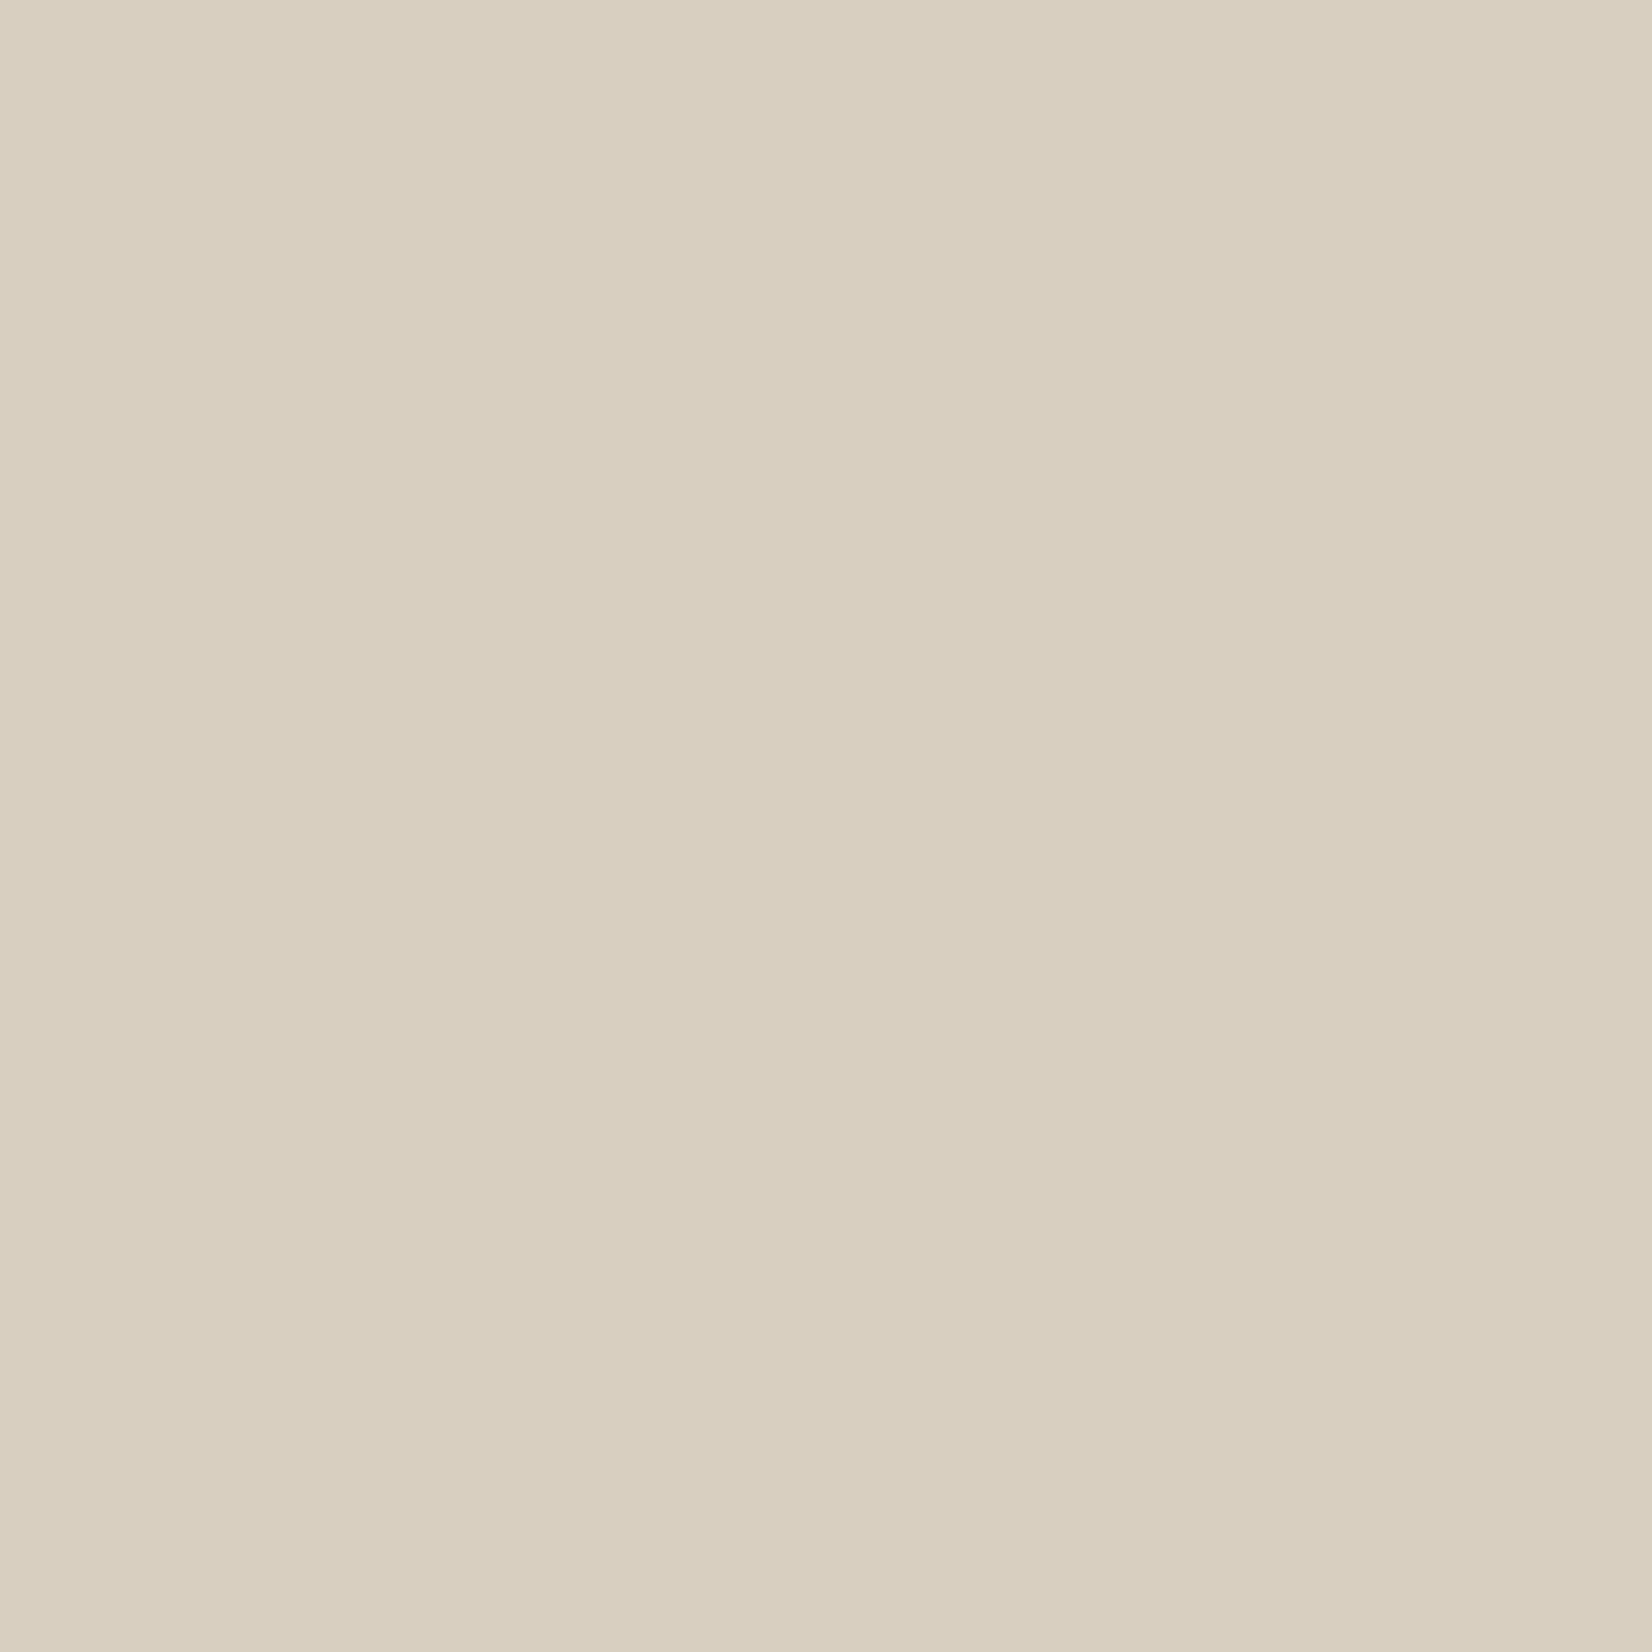 Tilda Tilda Basics Solids, Warm Sand - per cm or $20/m